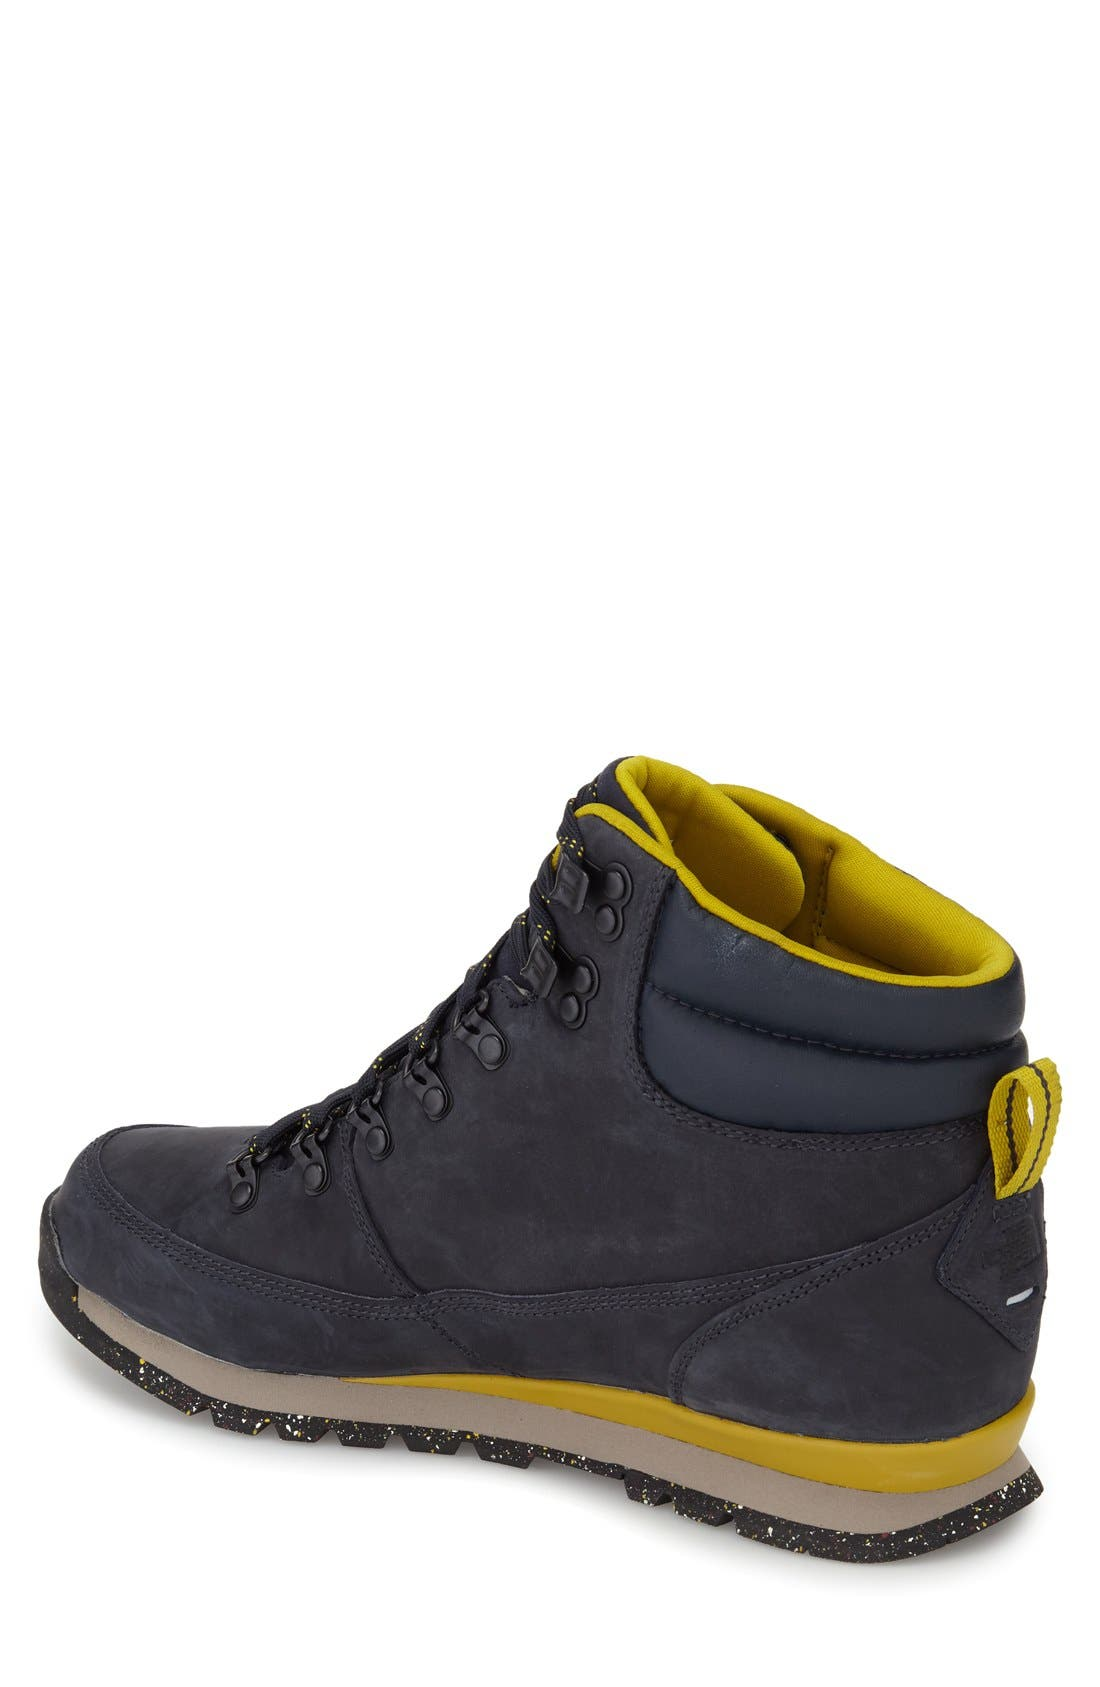 Alternate Image 2  - The North Face 'Back to Berkeley Redux' Waterproof Boot (Men)